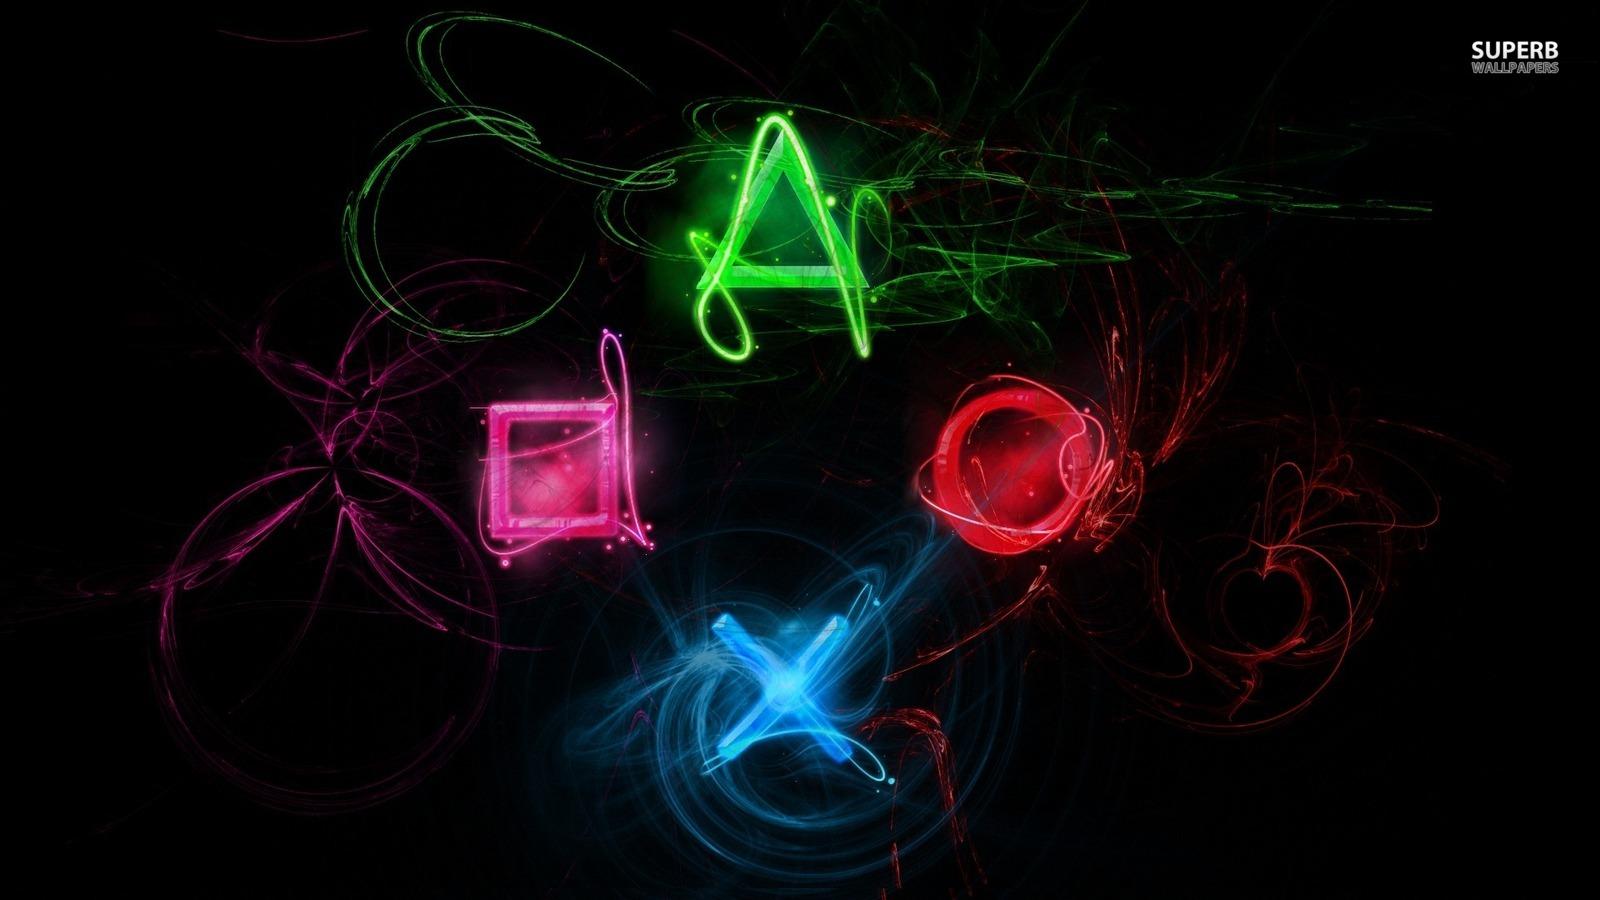 Neon Playstation